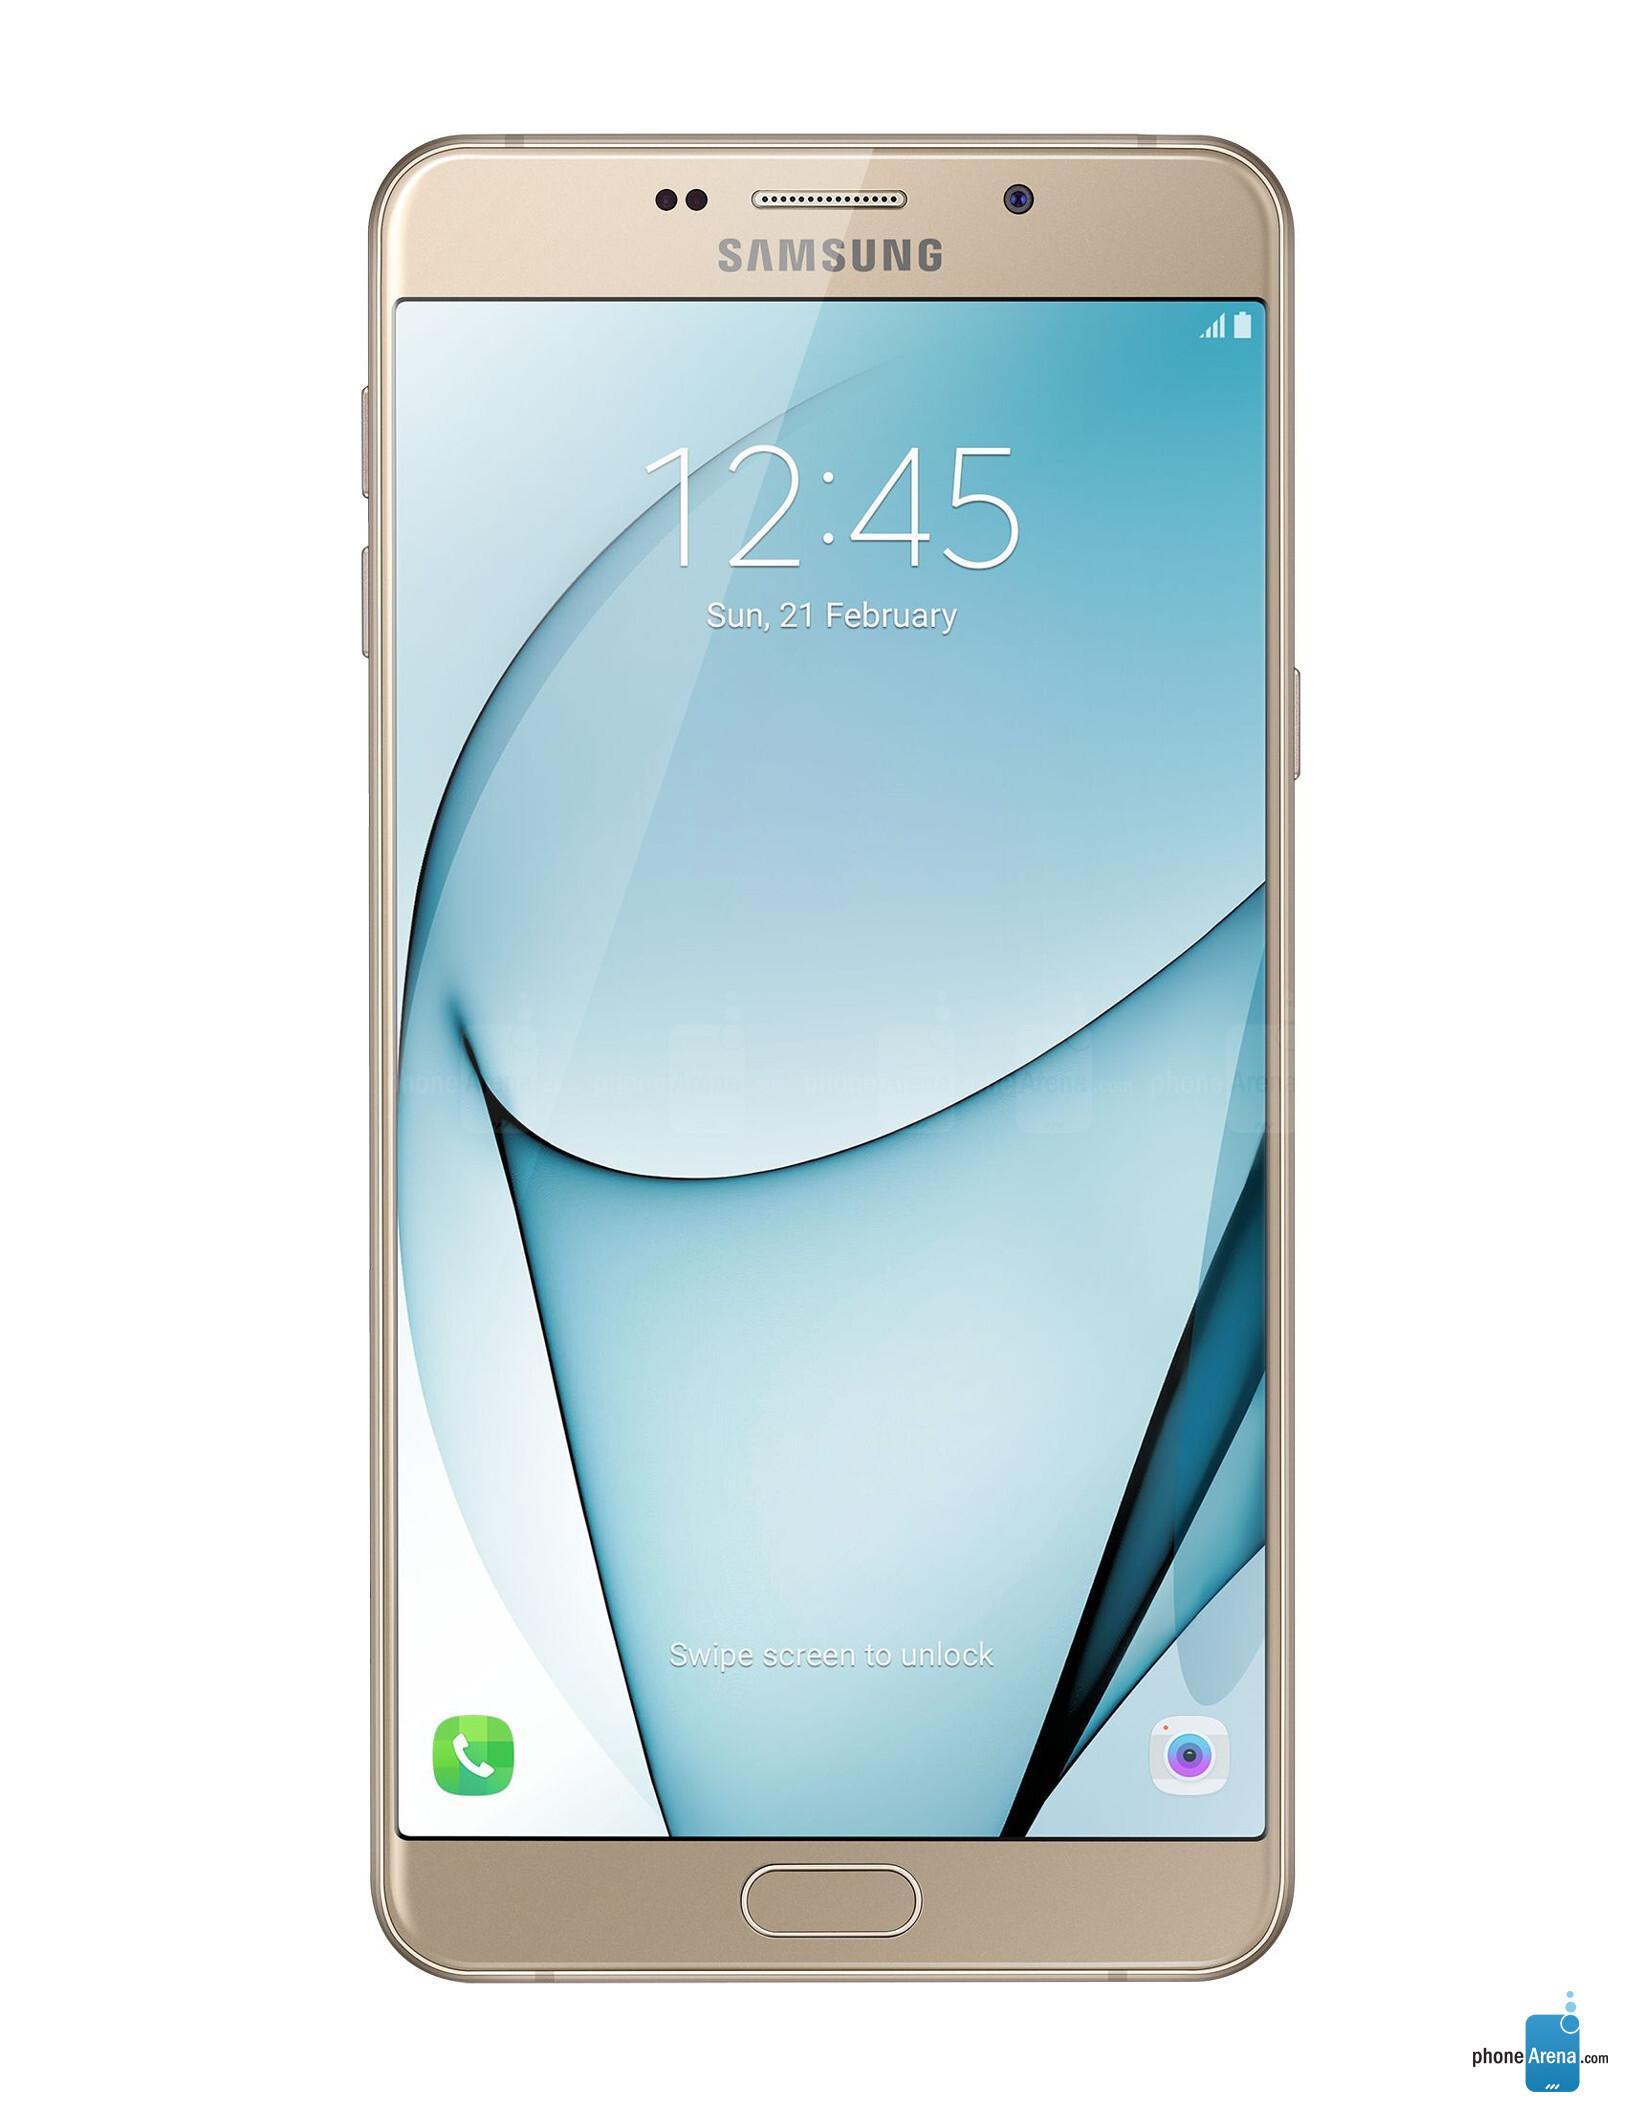 Samsung Galaxy A9 Pro (2016) full specs